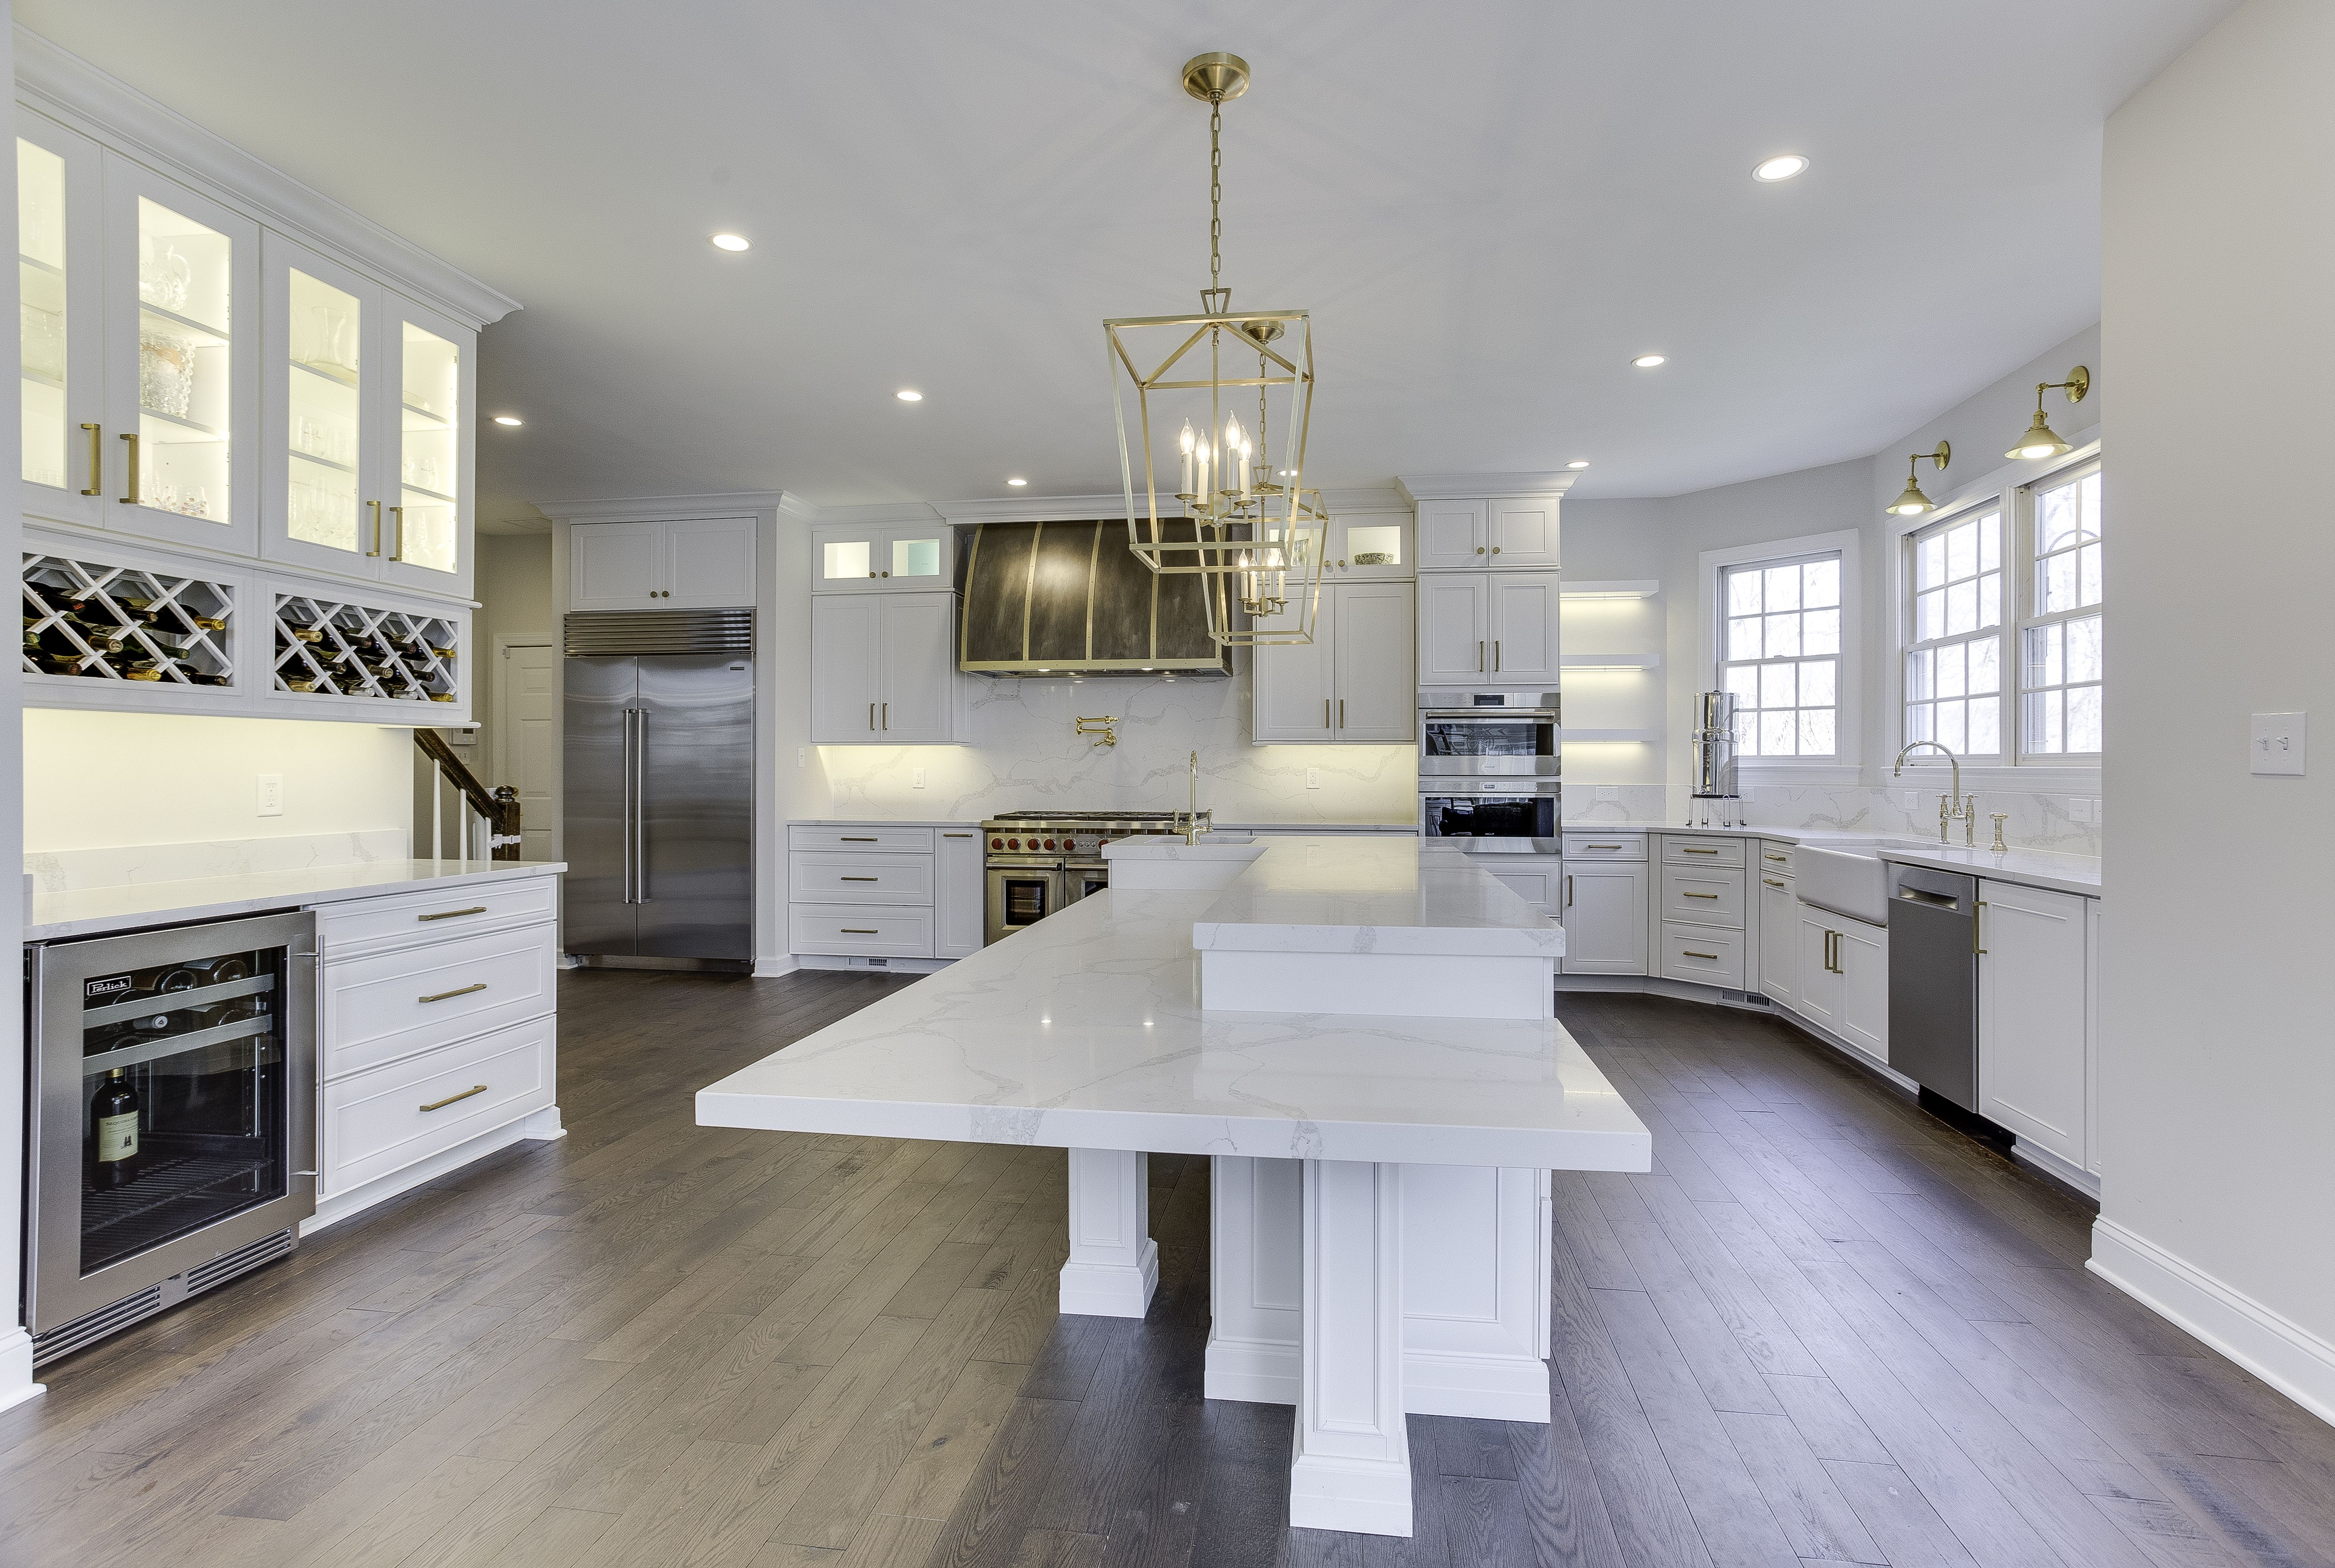 Modern Kitchen Cabinets Renovation Services In Portland